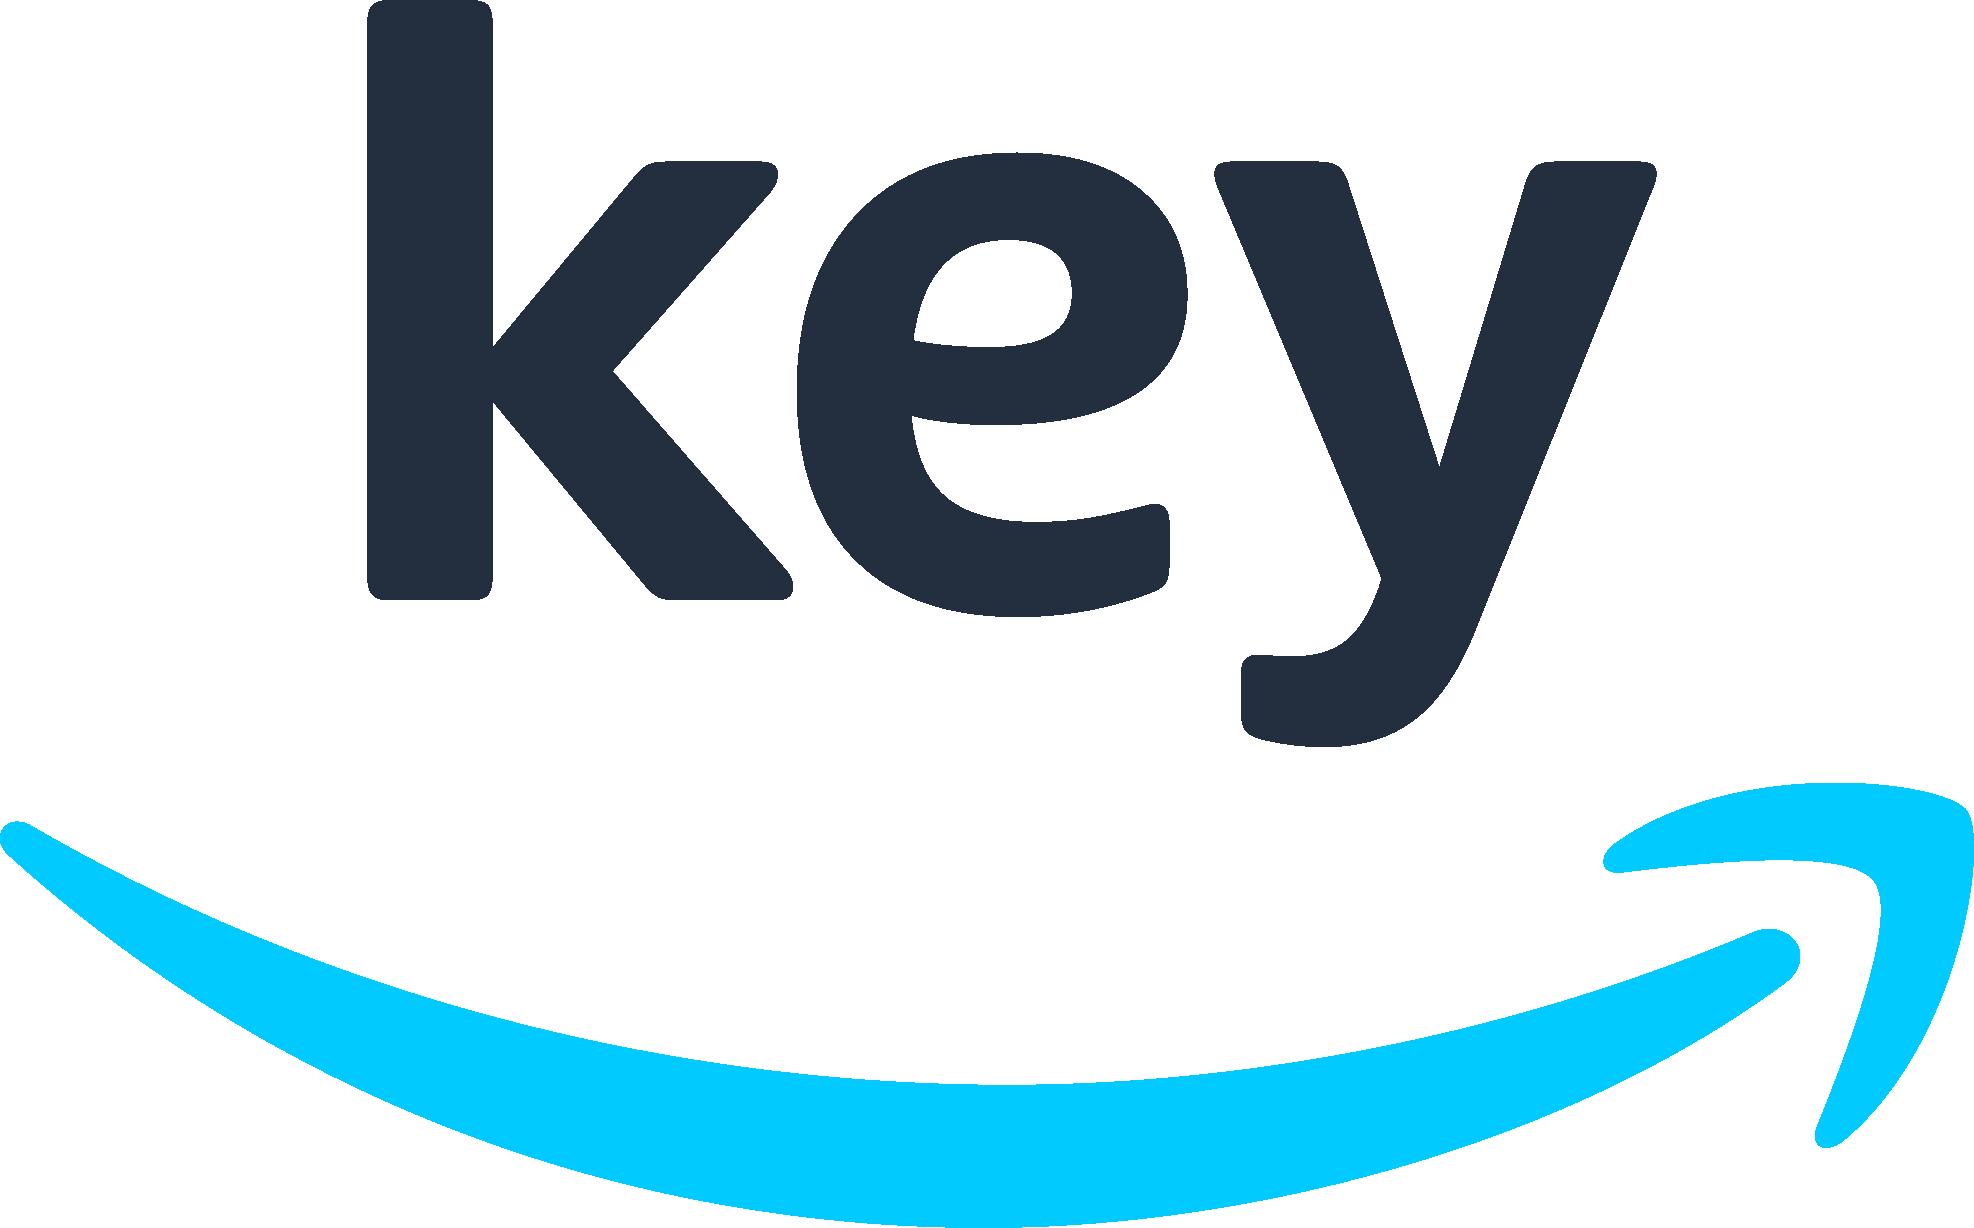 amazon key for business logo